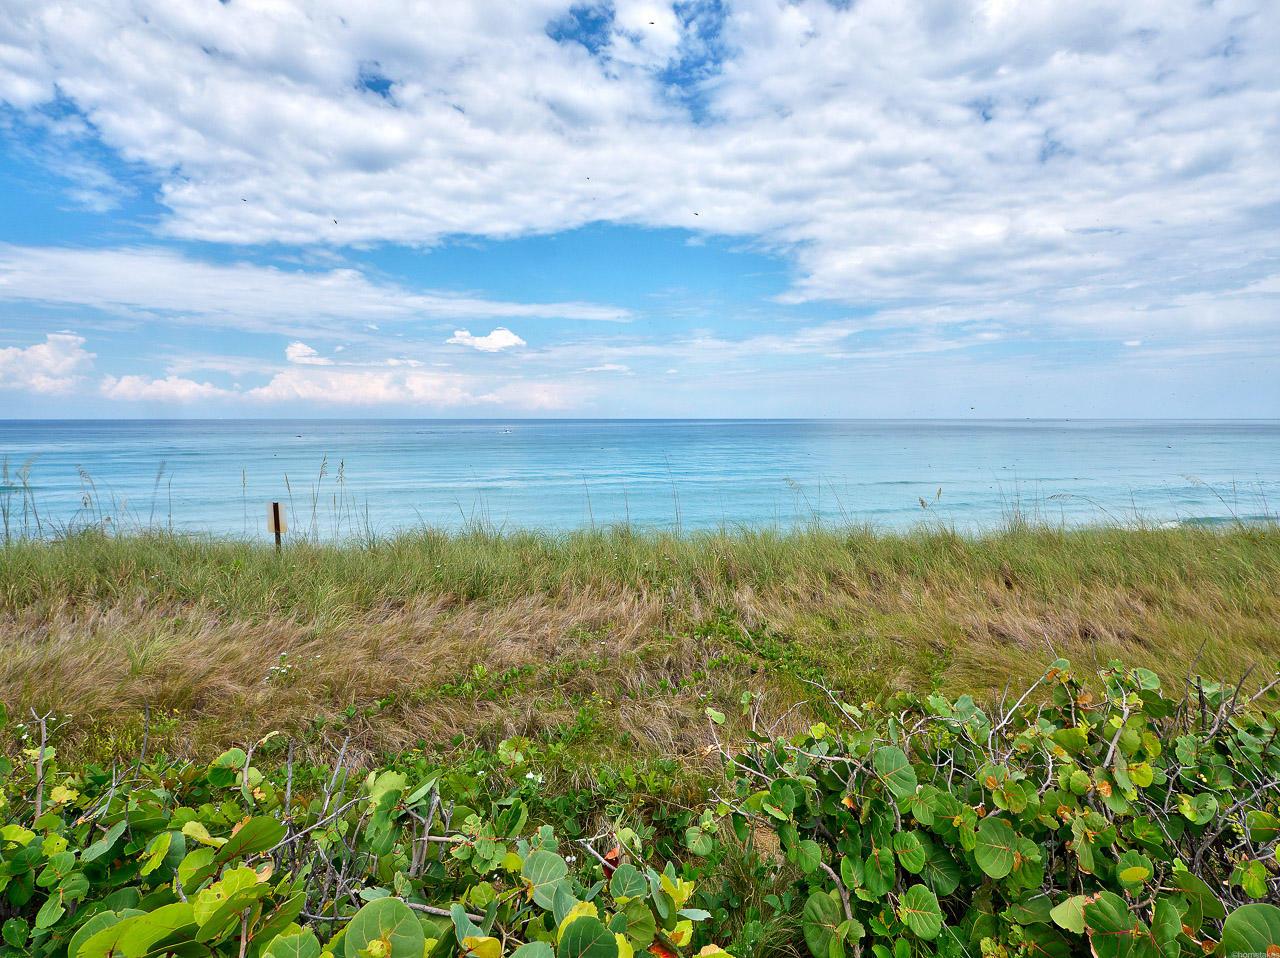 REACHES SINGER ISLAND FLORIDA